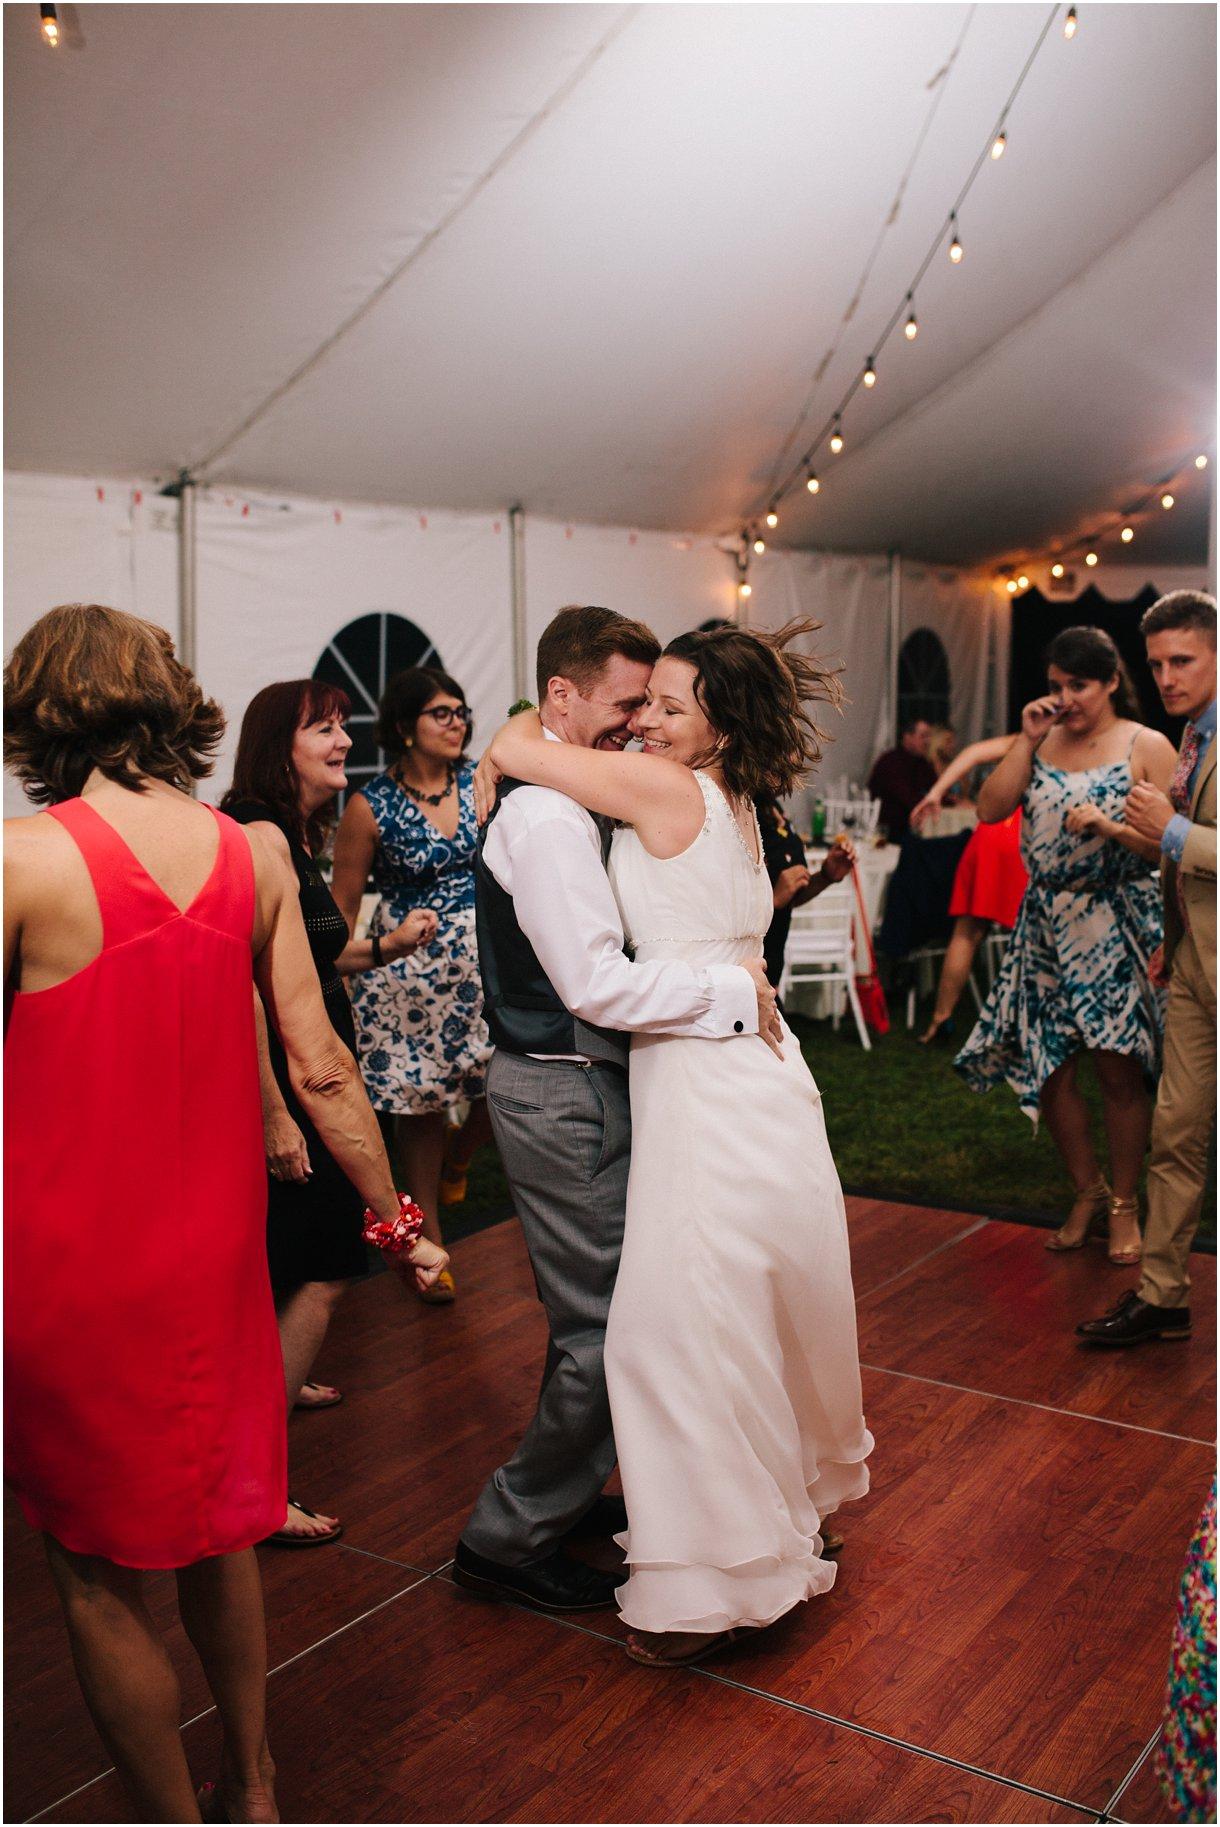 Dayton wedding photographer 4027